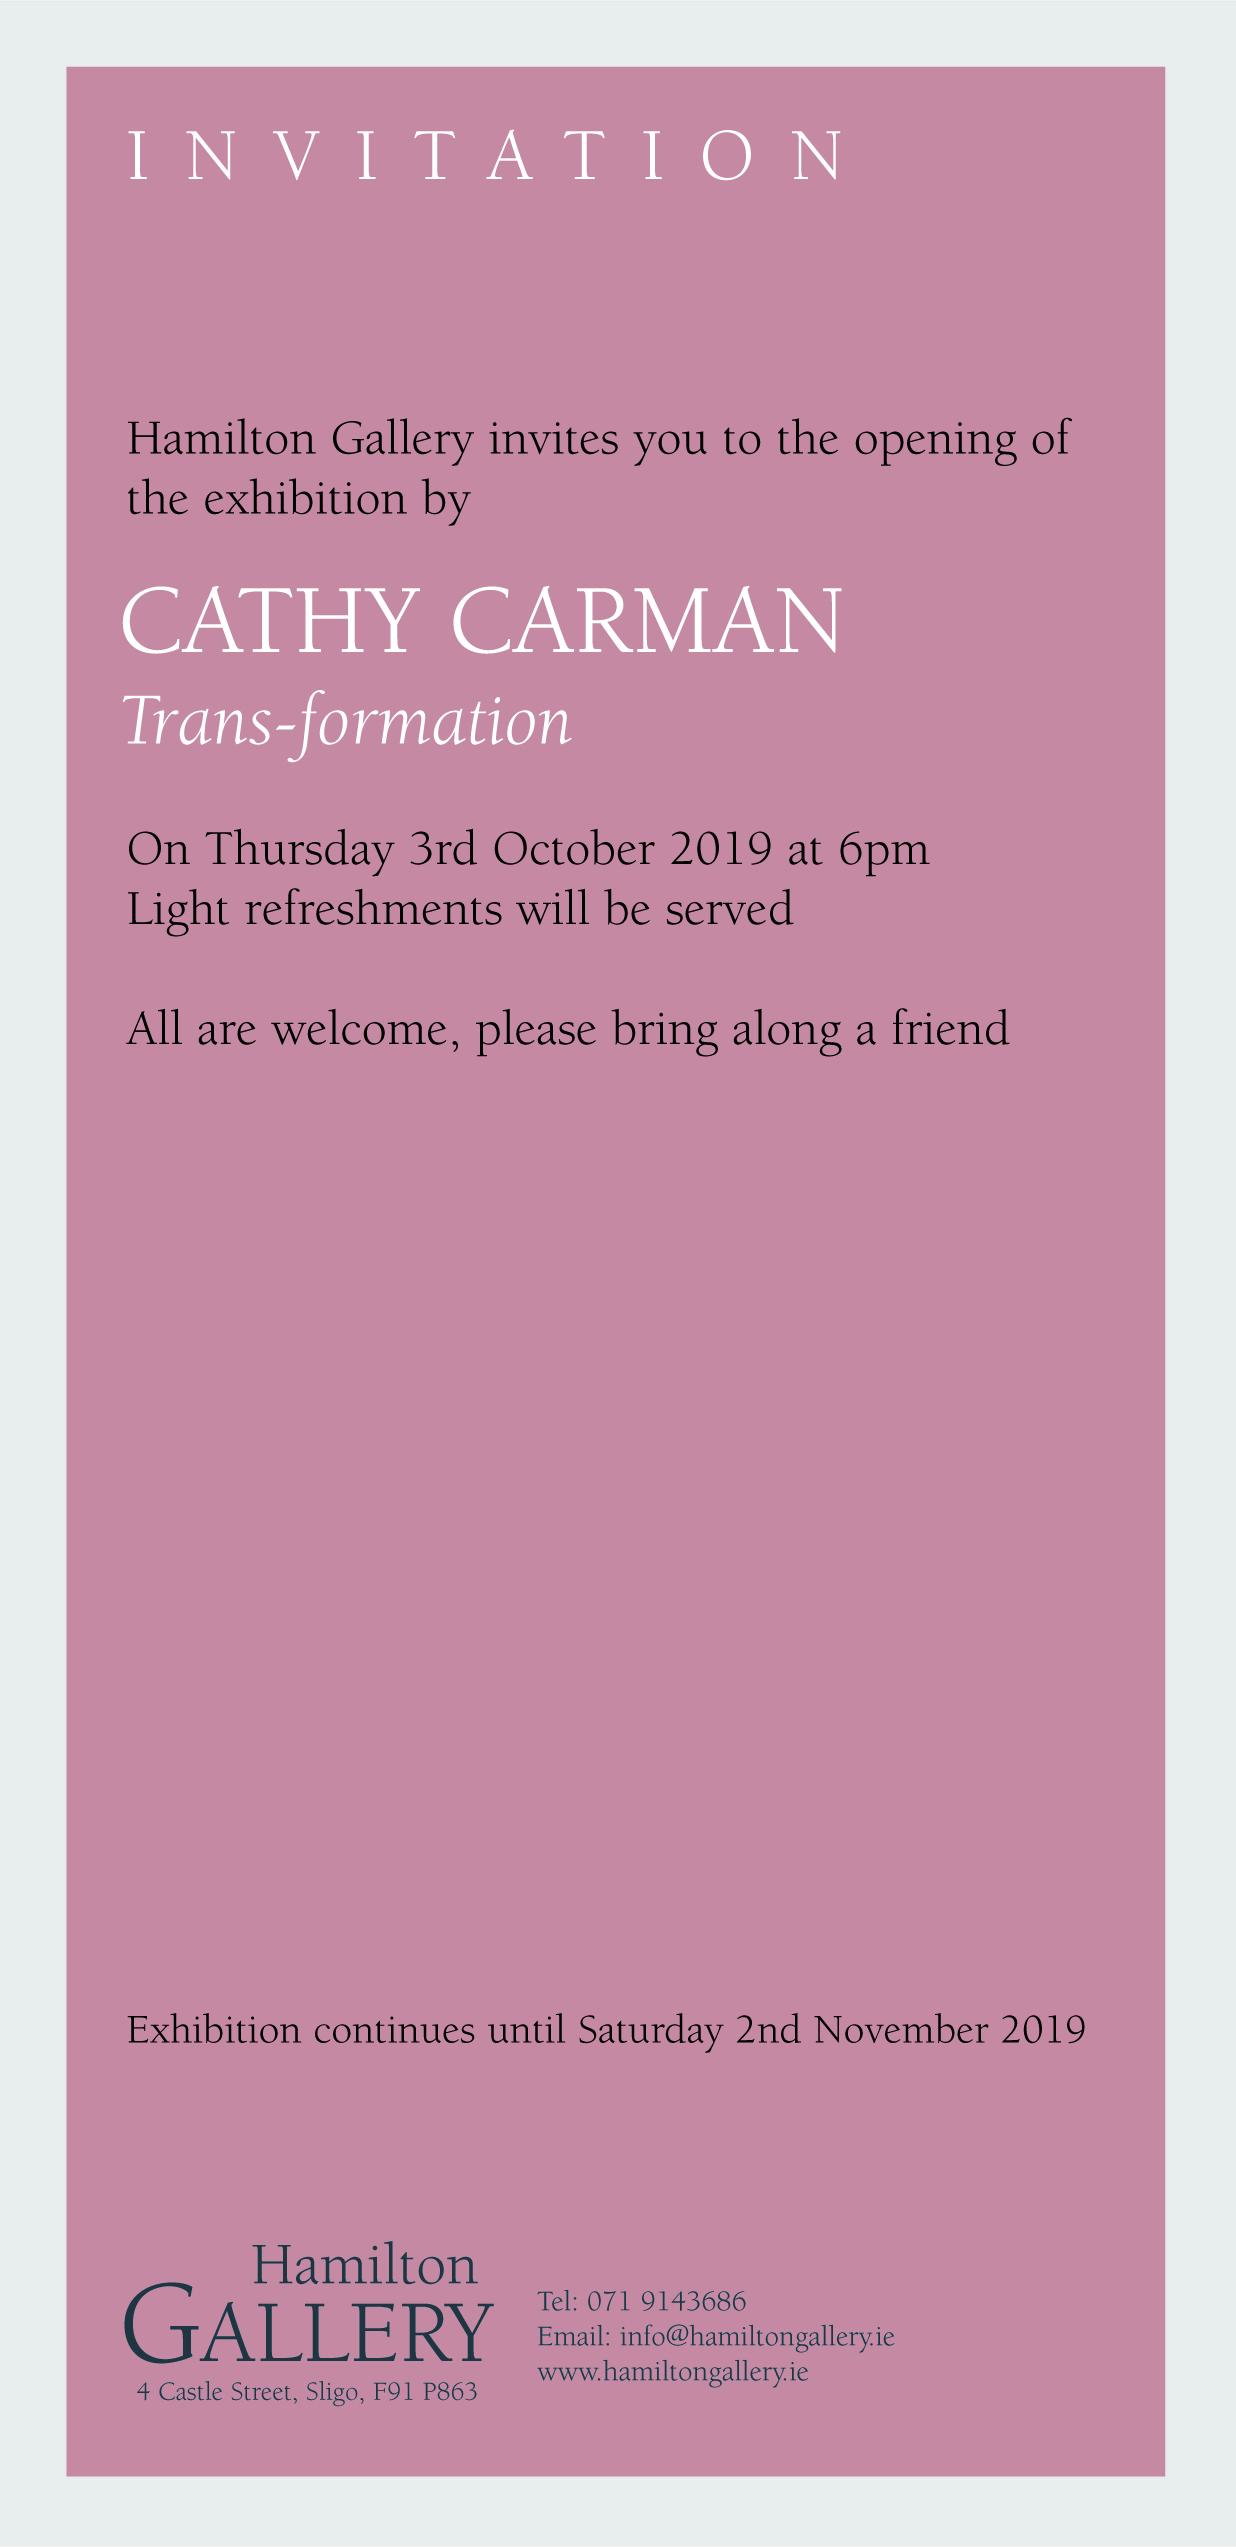 invite8b.jpg